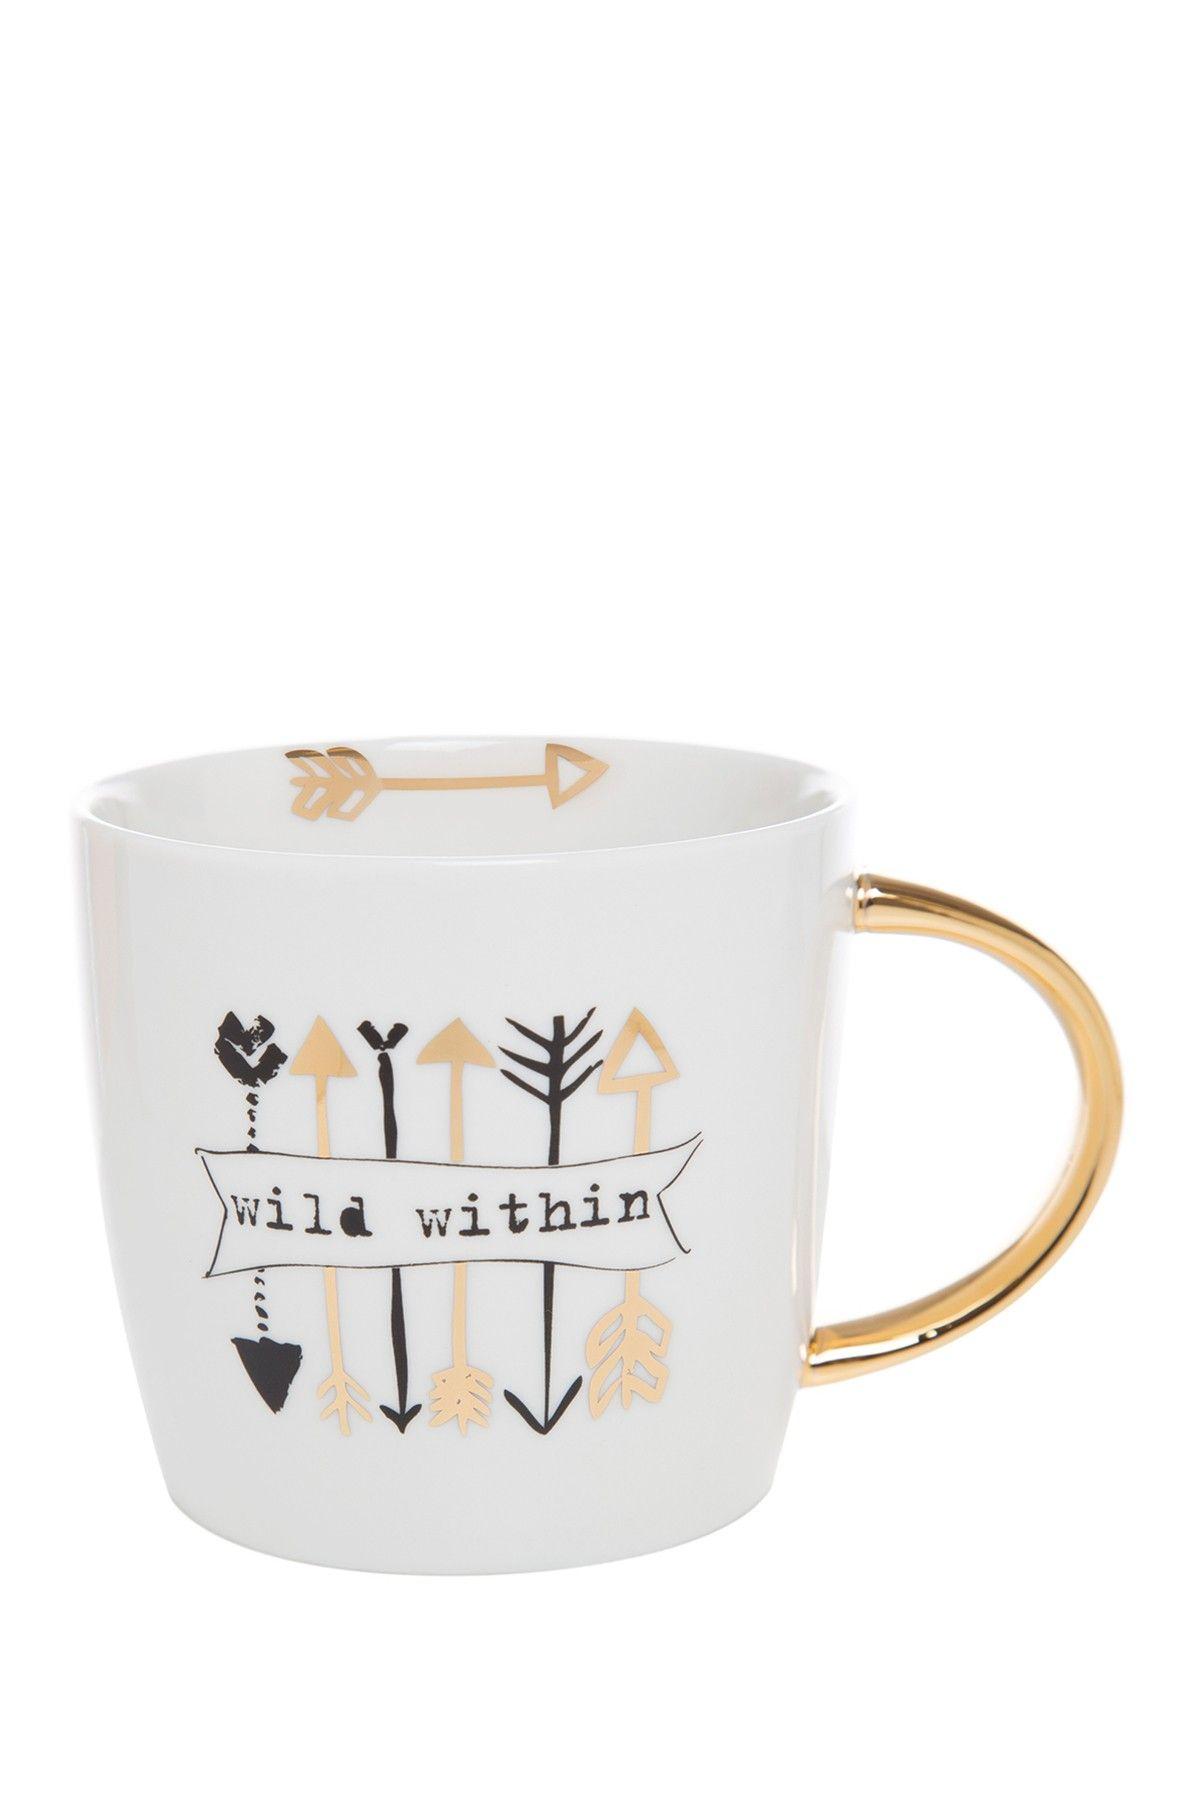 Slant Designs | Wild Within Mug - 14 oz | Gift Guide | Diy ...